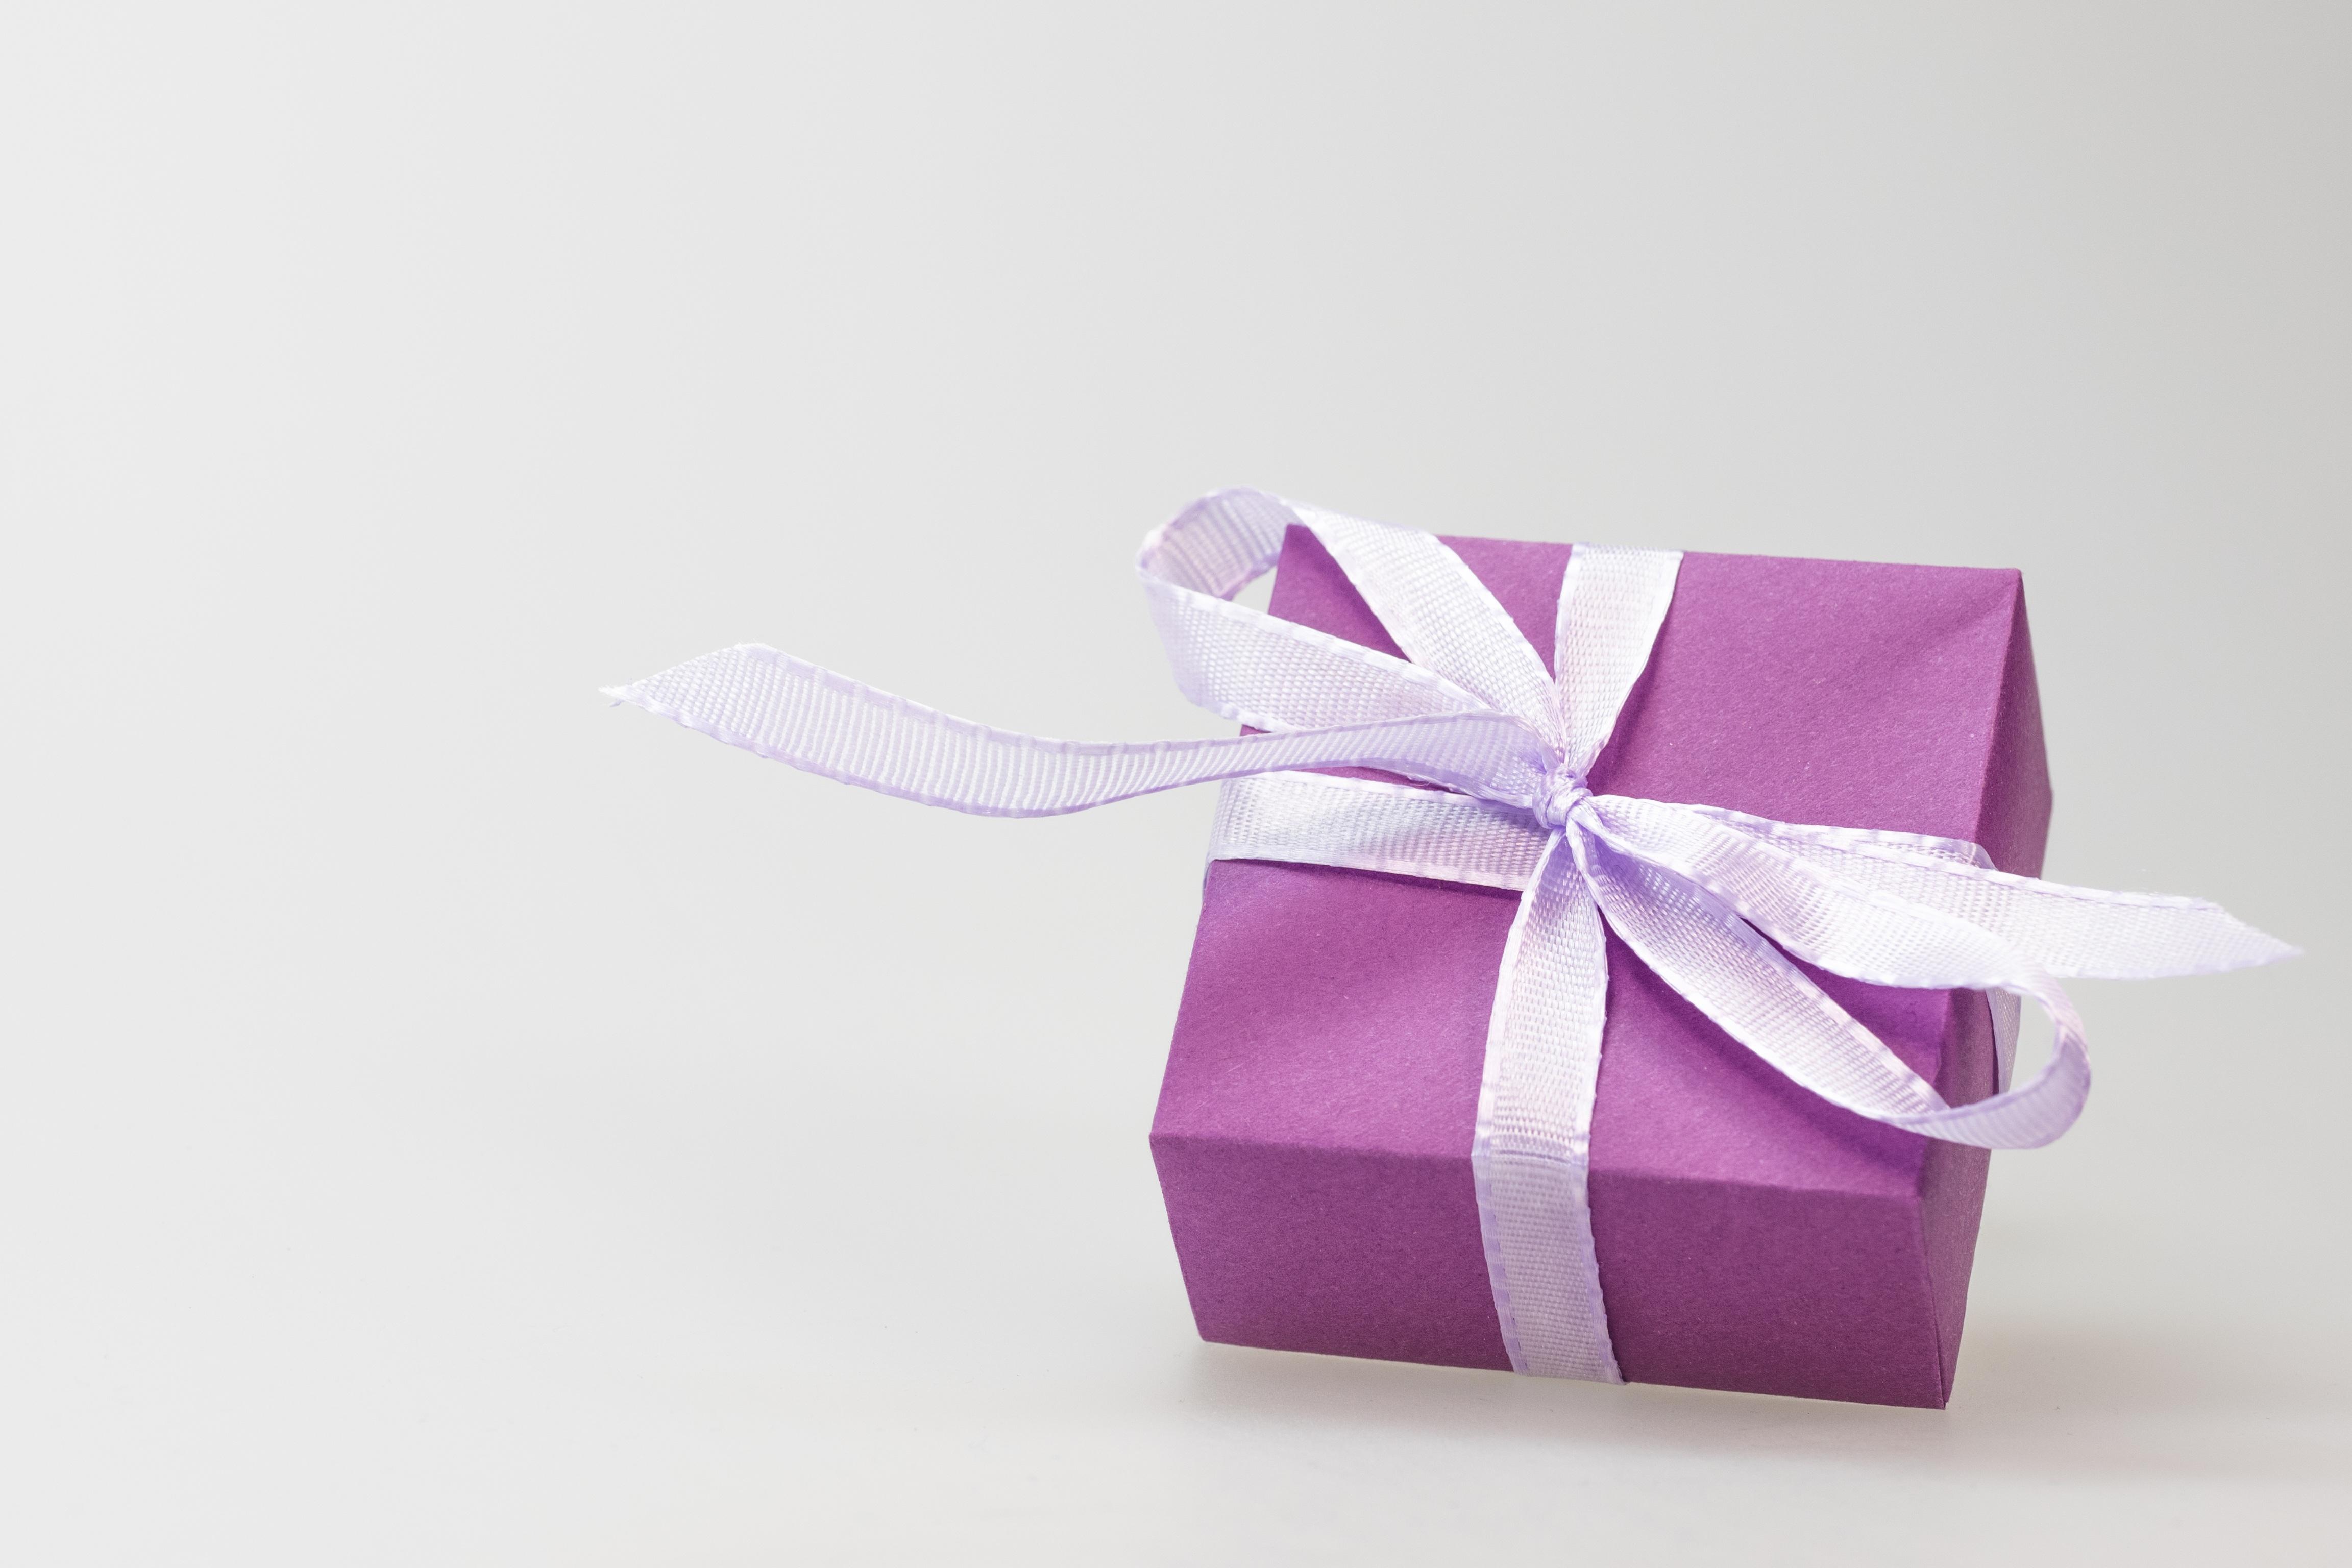 Free images flower purple petal gift box pink paper ribbon flower purple petal gift box pink paper ribbon present art magenta packaging negle Choice Image